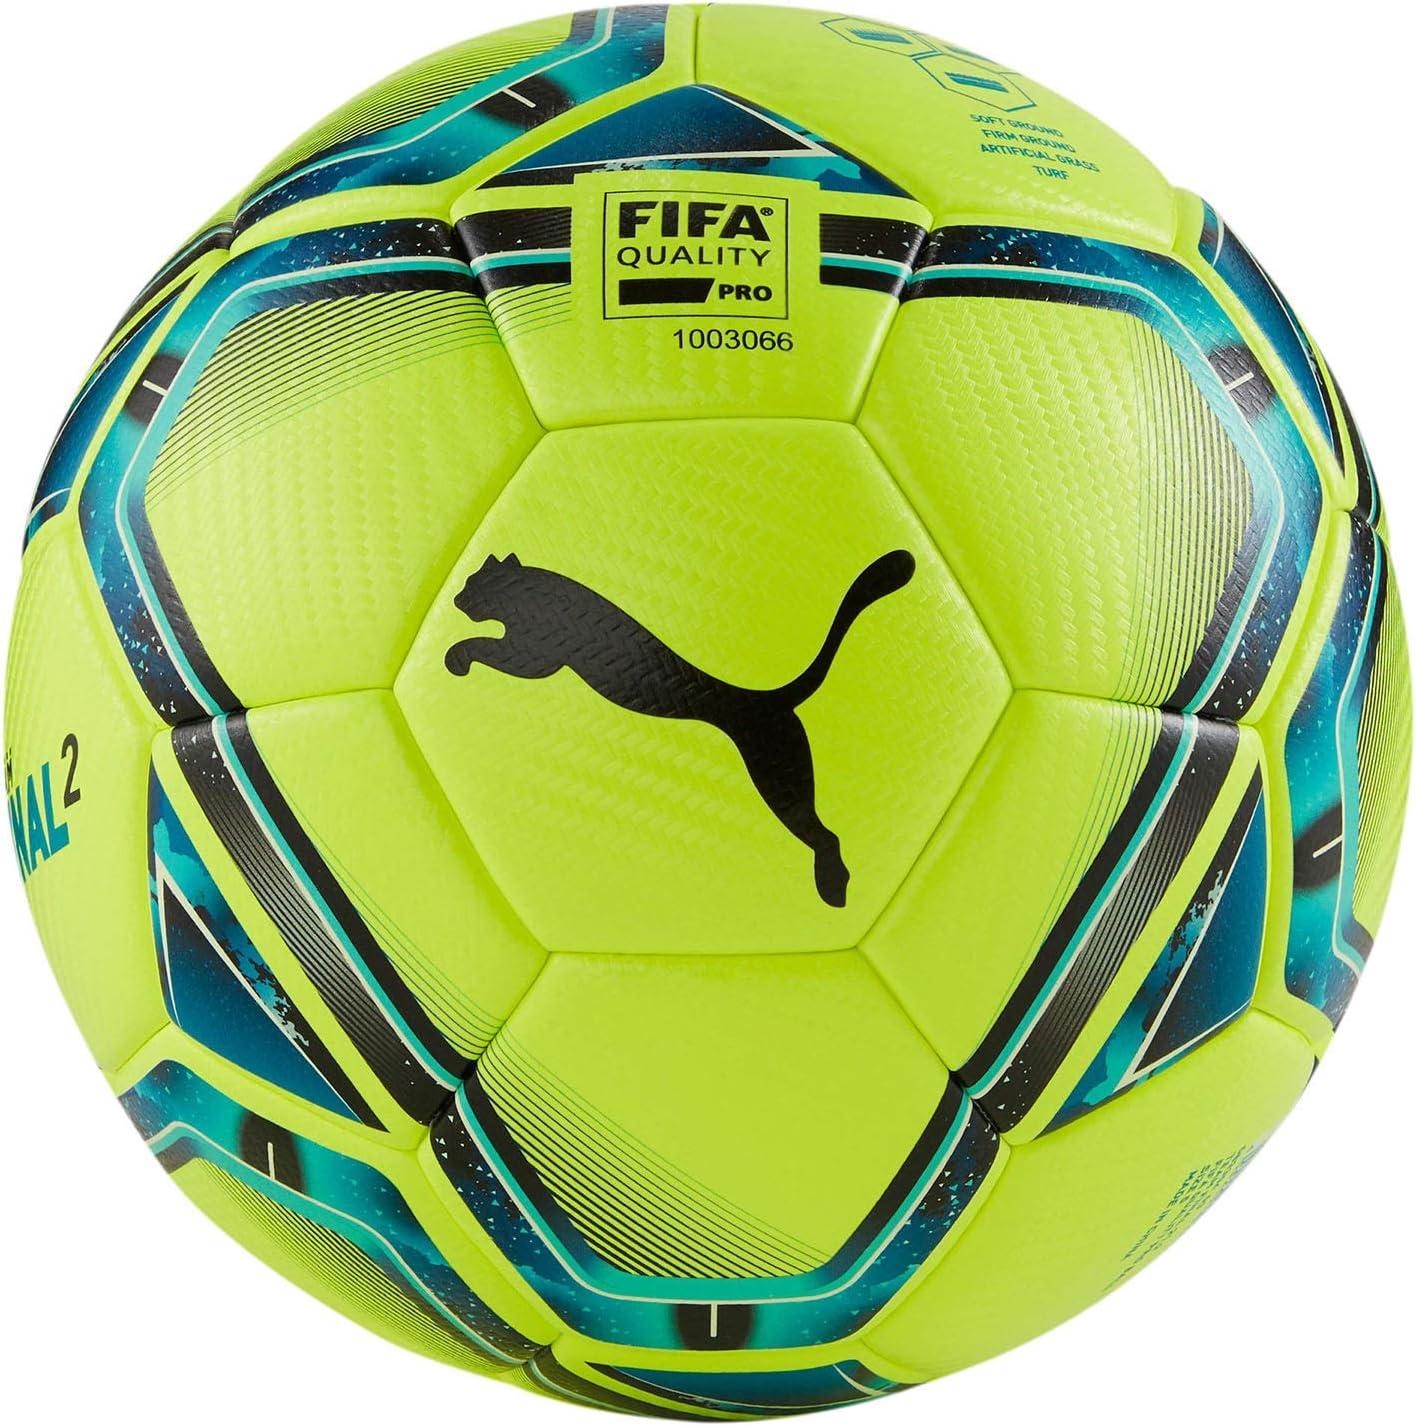 TEAMFINAL 40% OFF Cheap Sale 21.2 FIFA Quality PRO Green- Mail order cheap Lemon Ball Tonic-Spectra